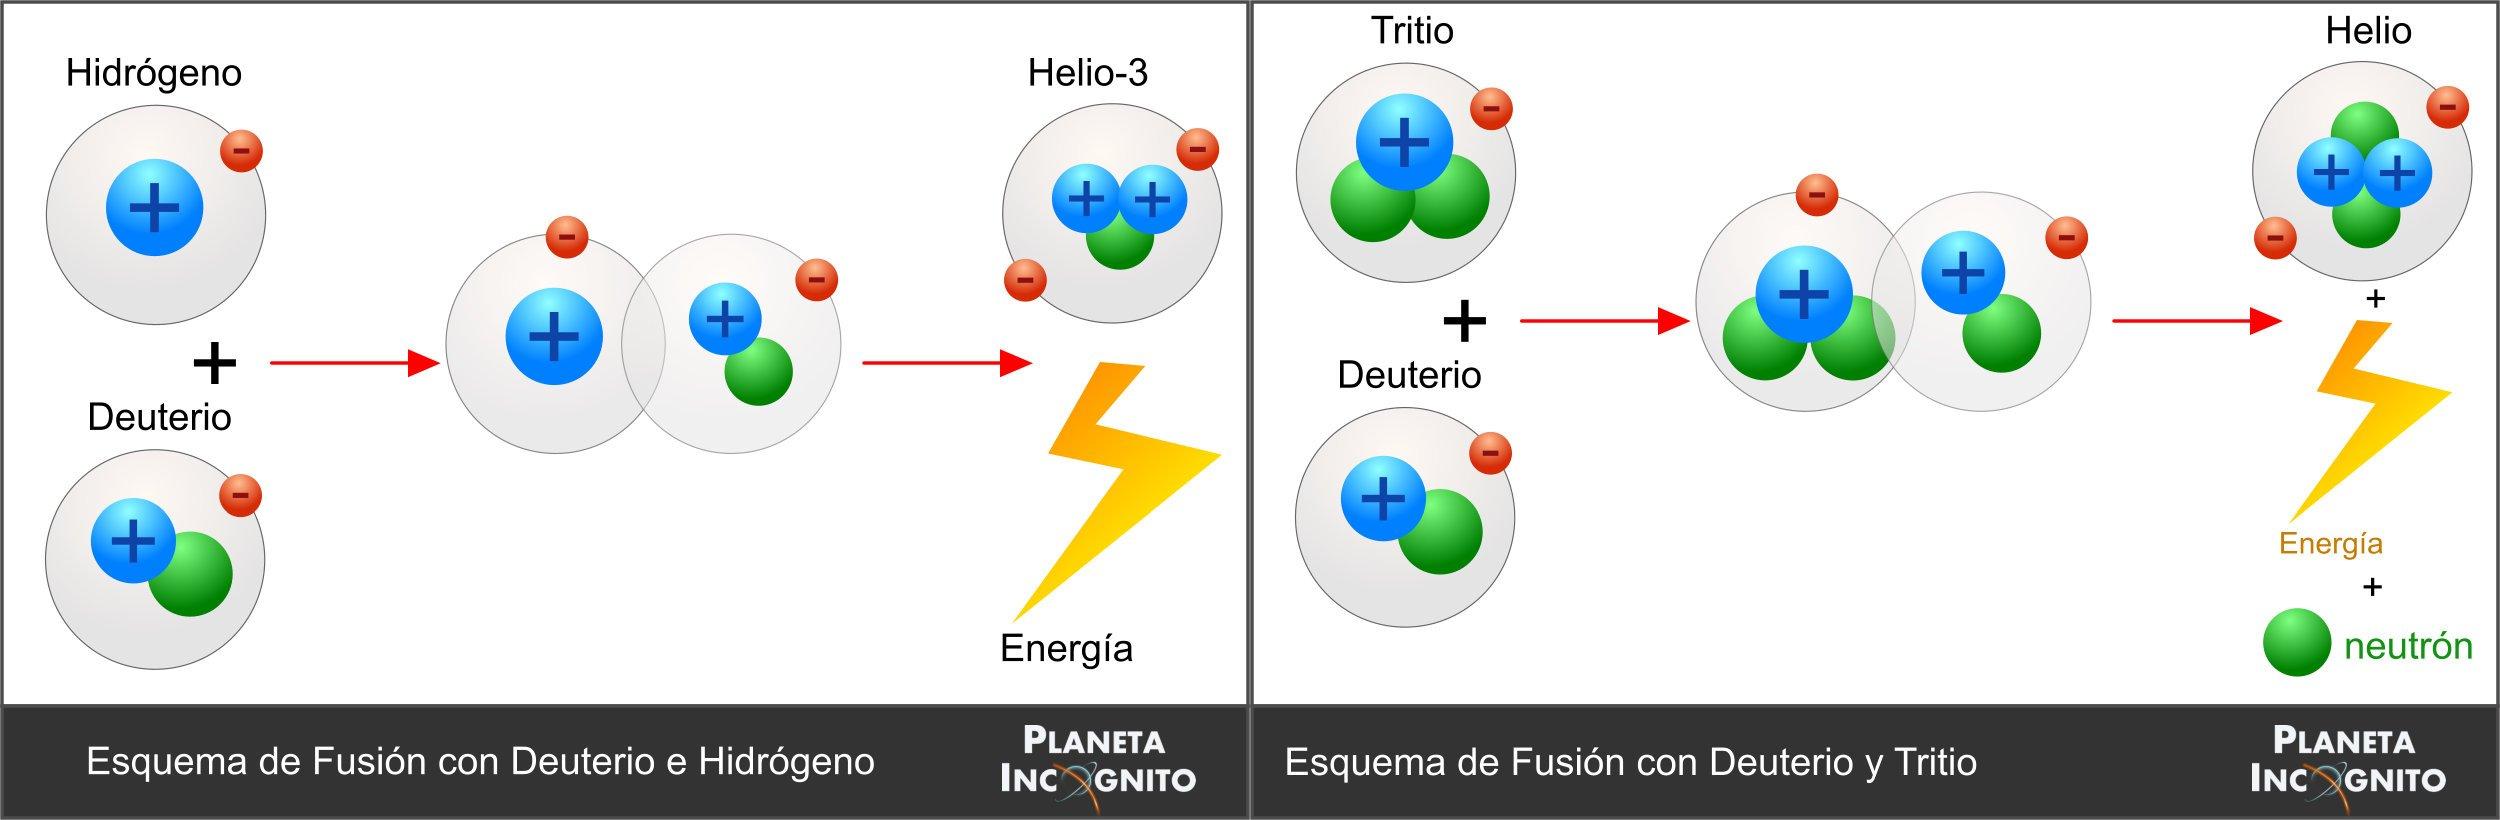 Fusion, Planeta Incógnito